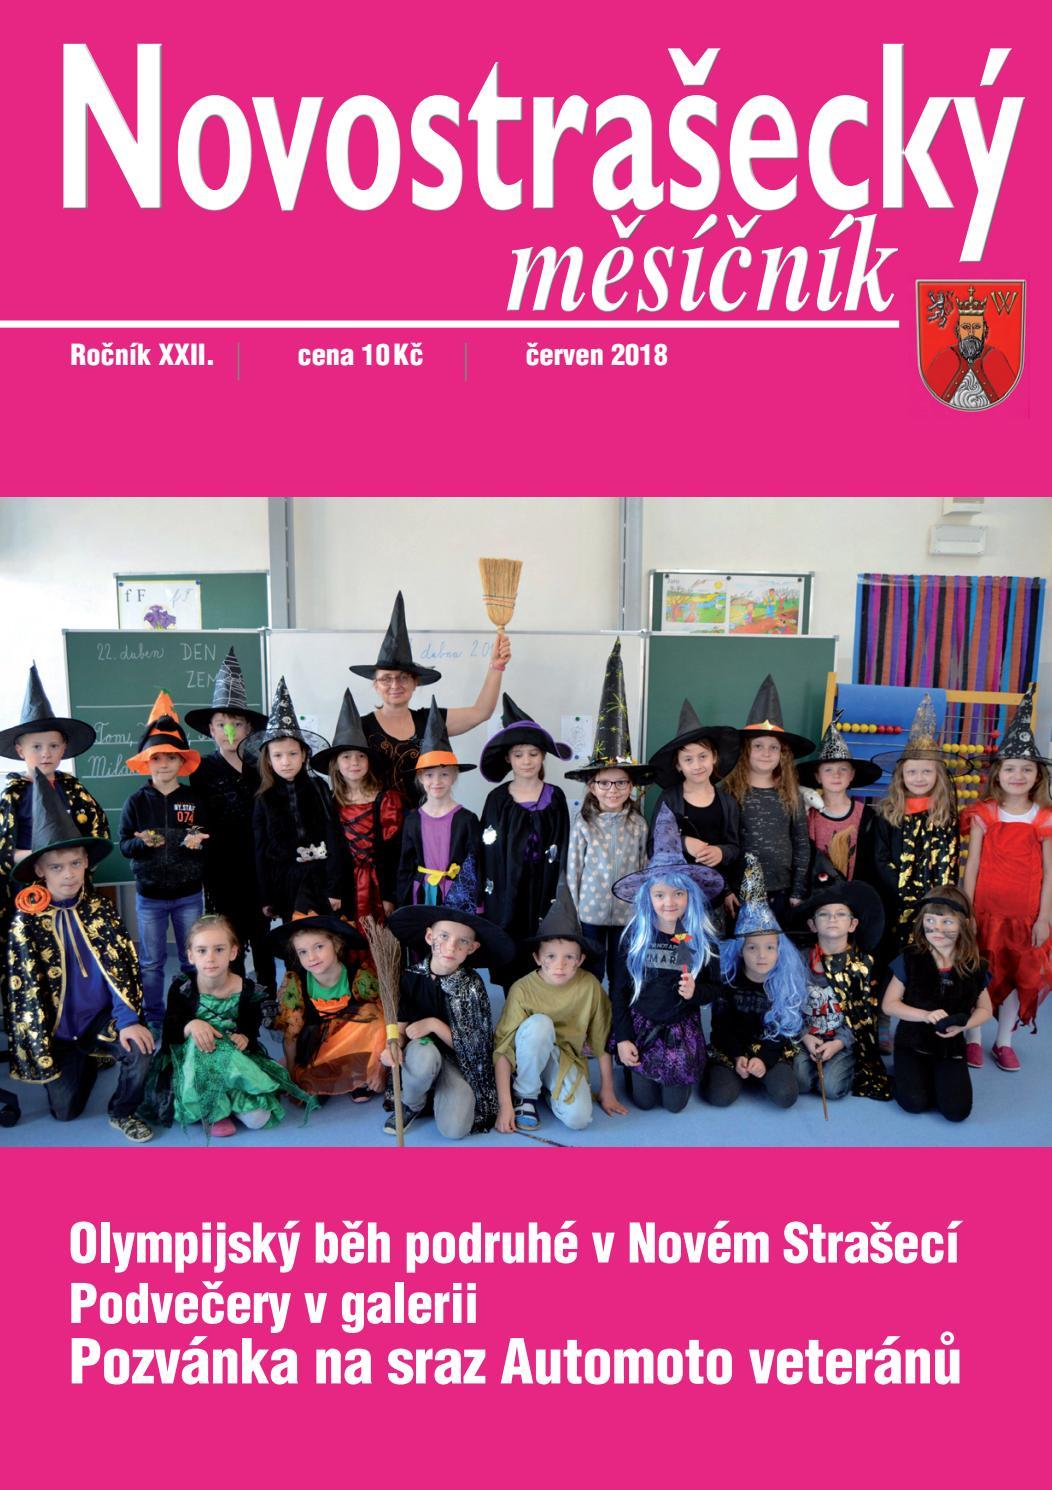 b13878fdad80 Červen 2018 by Novostrasecky mesicnik - issuu